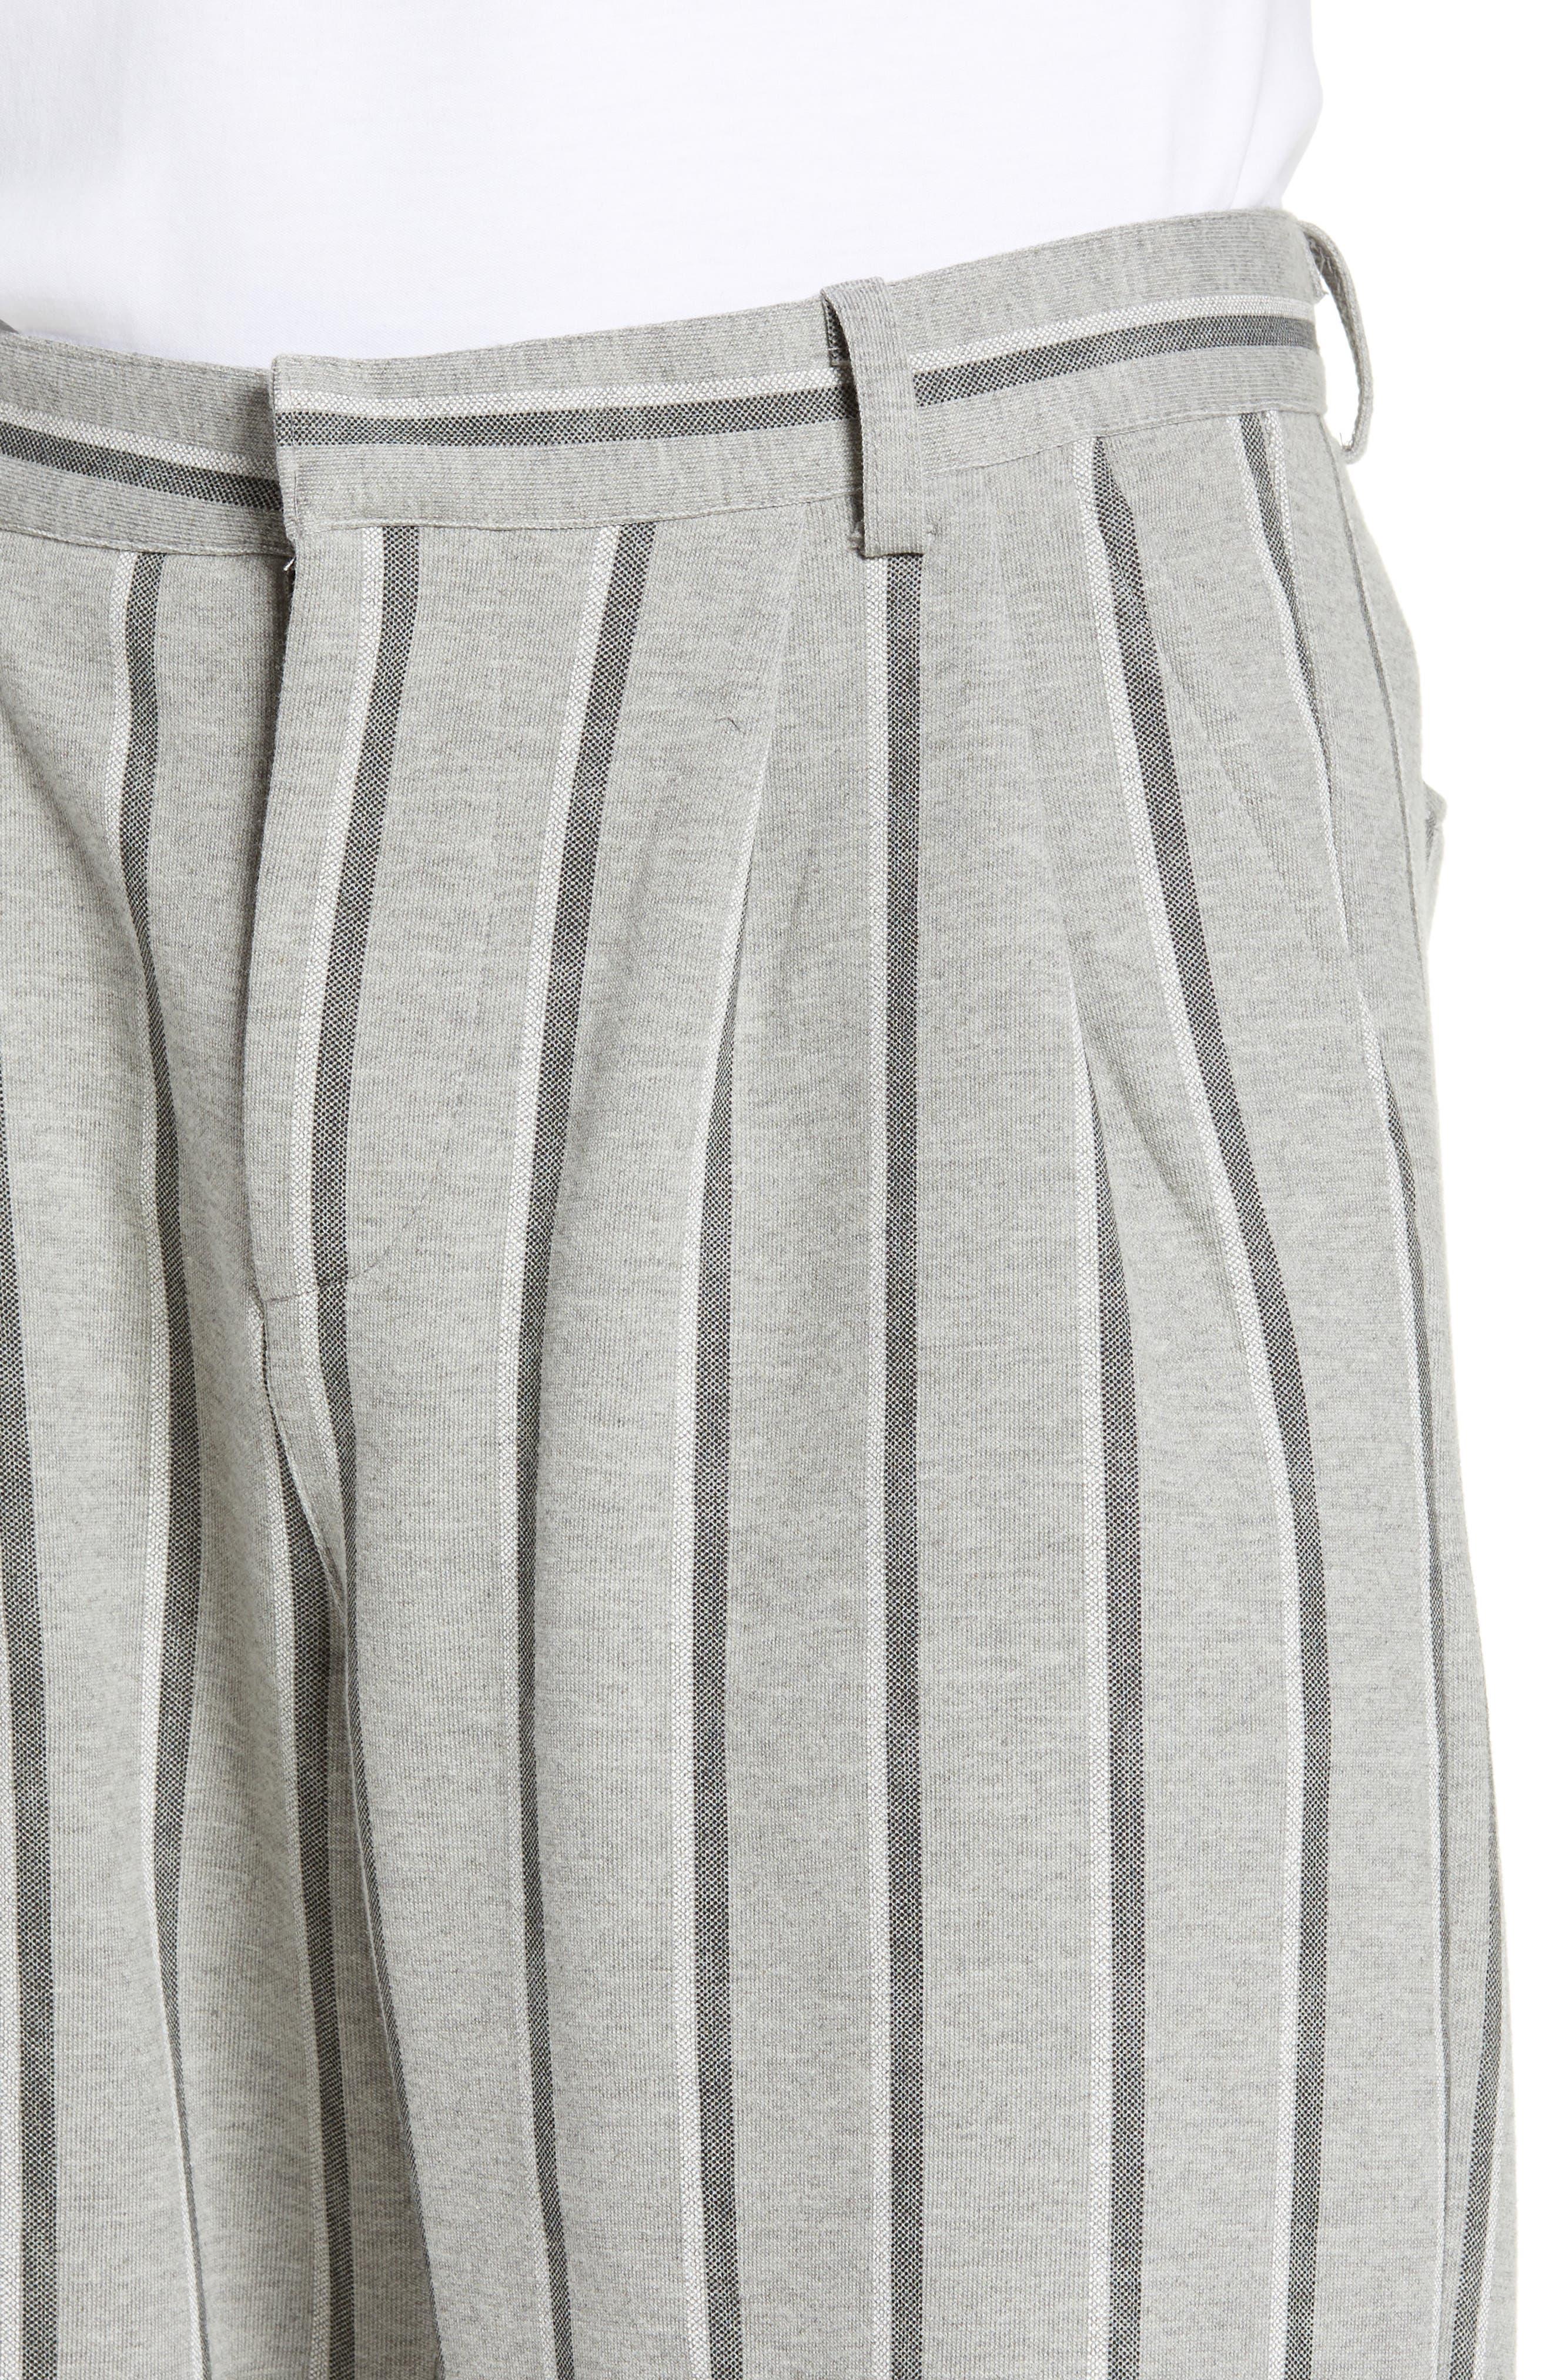 Pleated Plaid Crop Pants,                             Alternate thumbnail 4, color,                             GREY BLACK SHADOW STRIPE